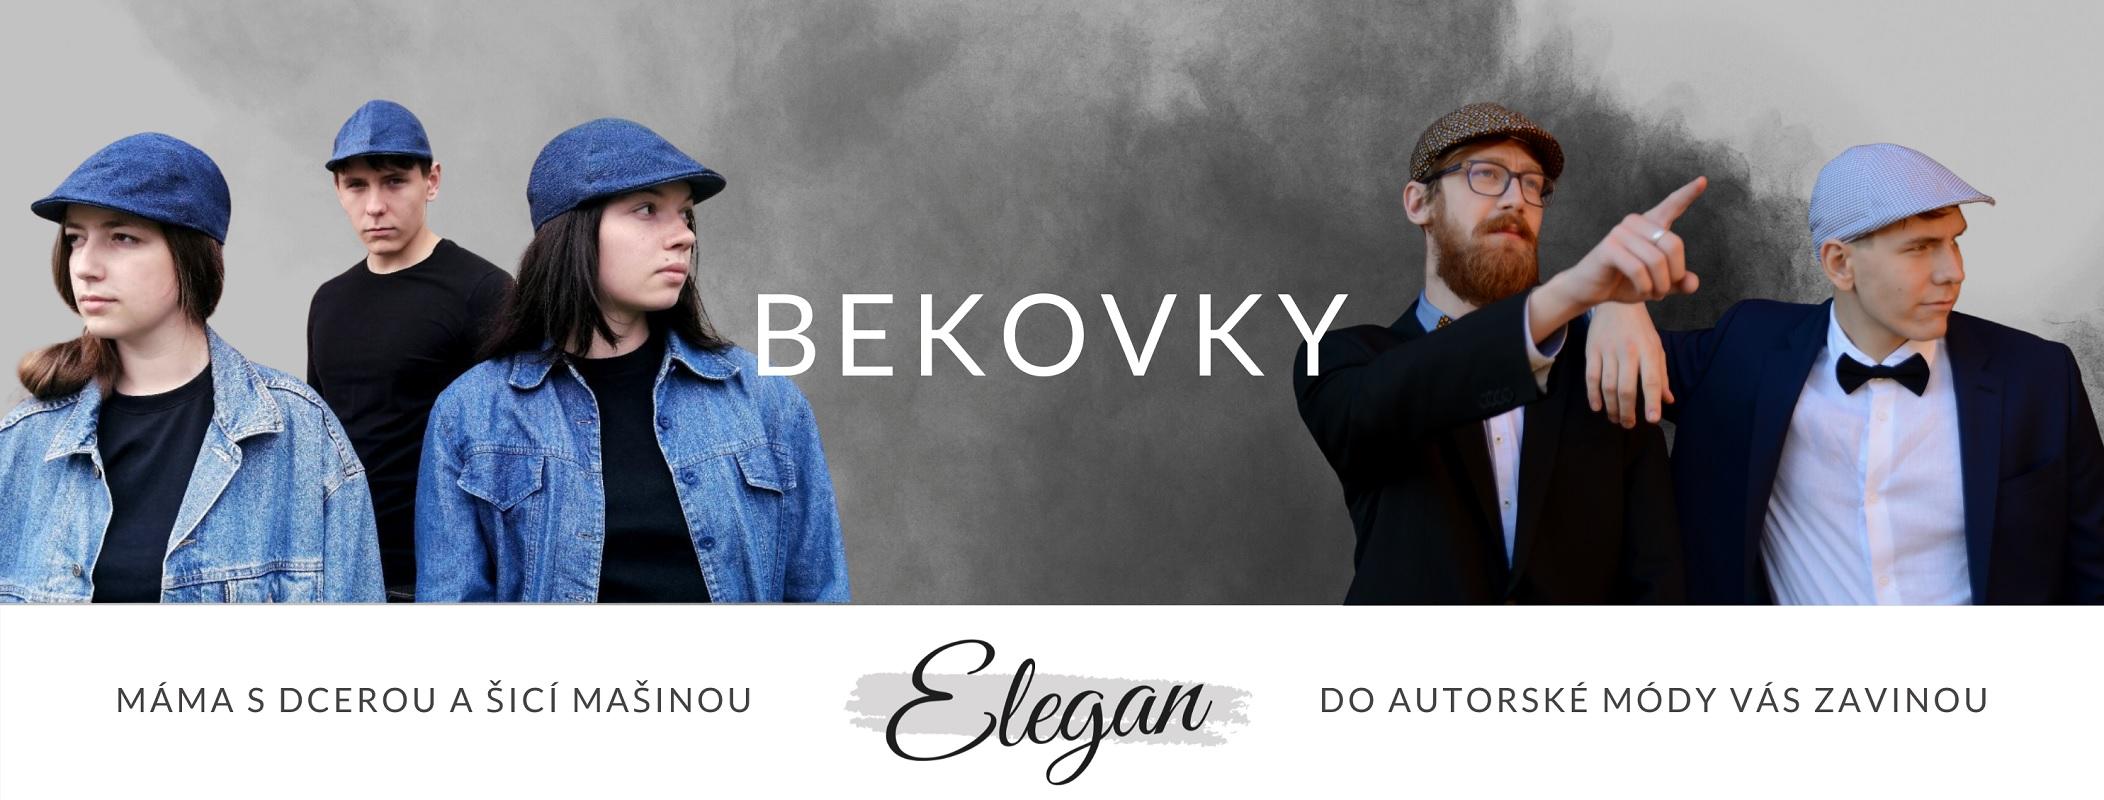 Bekovky